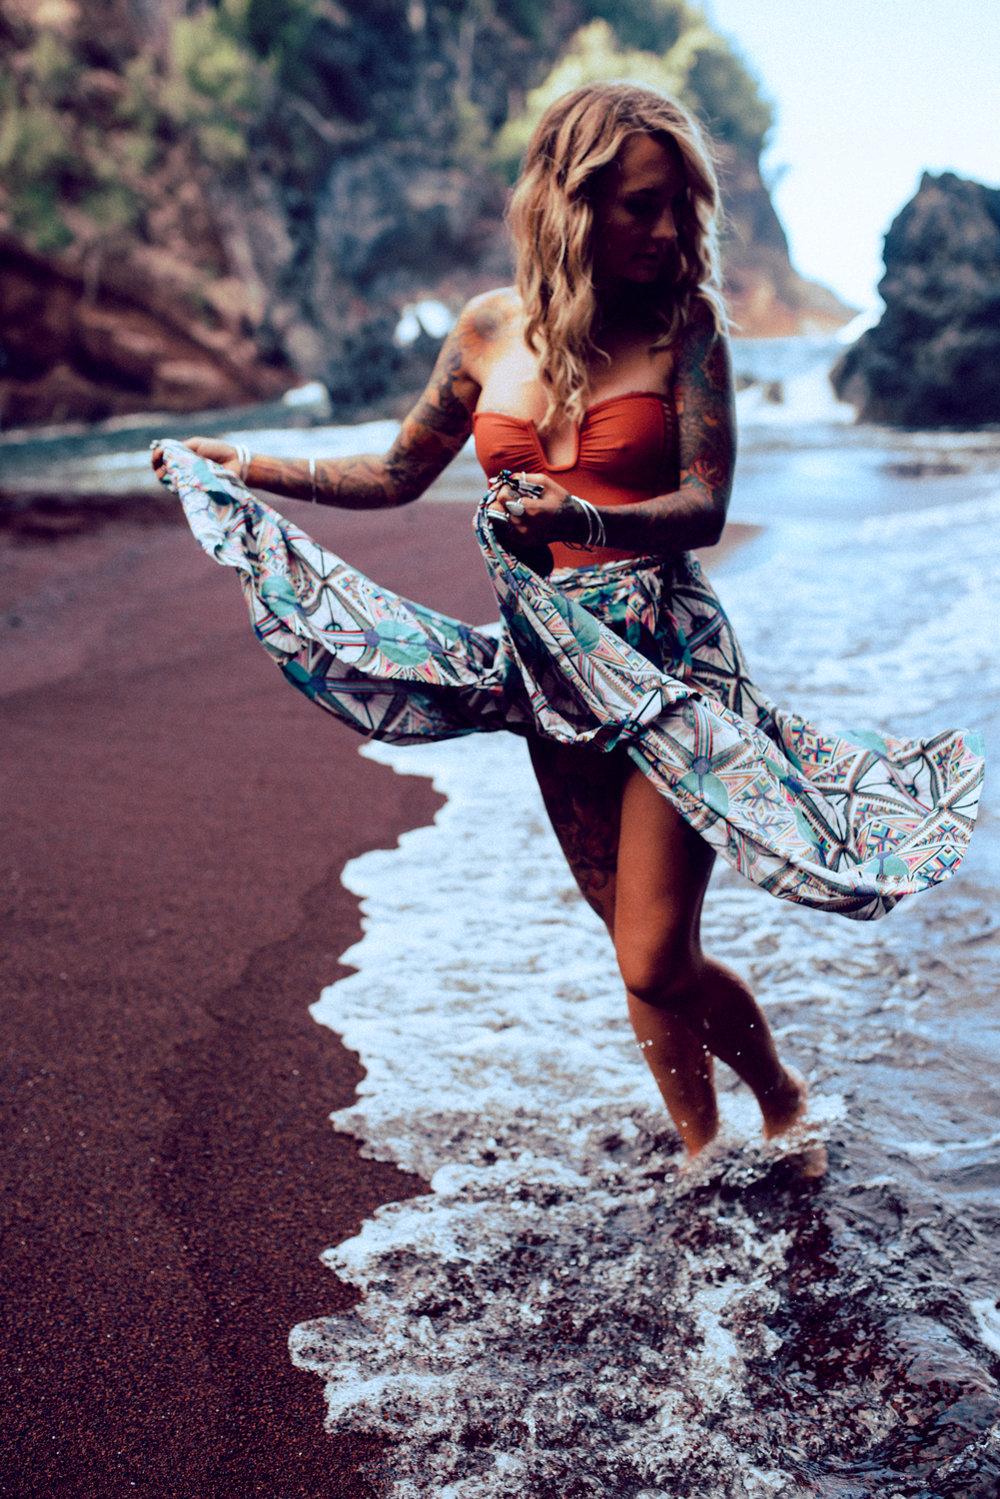 swimwear-photographer-milan-plus-shannon-9.jpg